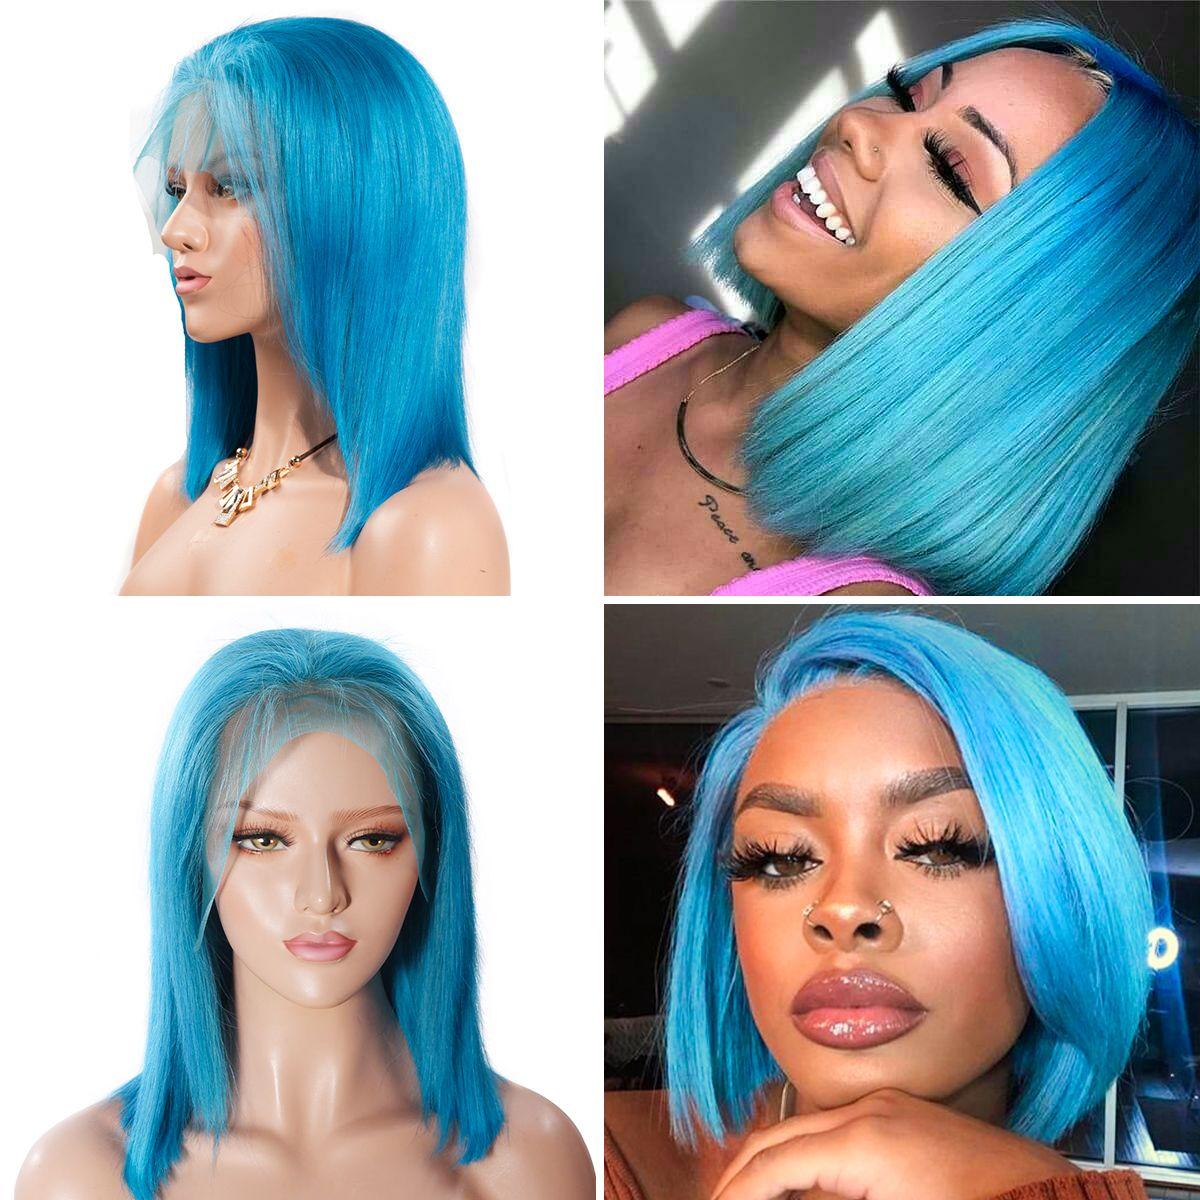 Colorful 13x6 Short Bob Straight Hair - Blue